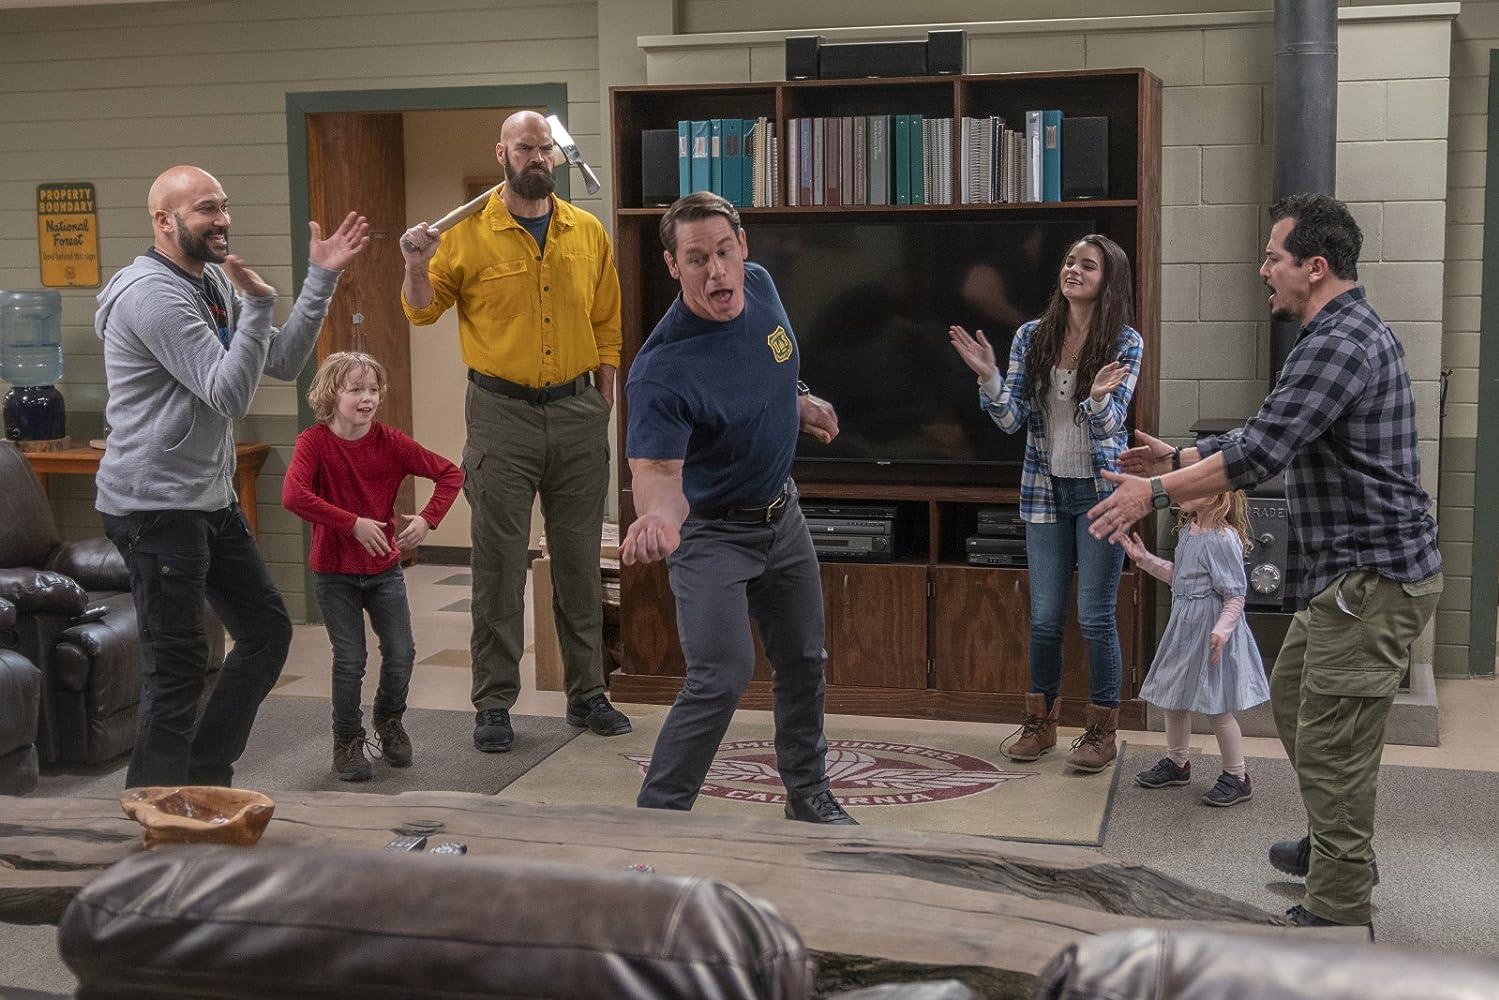 John Leguizamo, Tyler Mane, Finley Rose Slater, John Cena, Keegan-Michael Key, Brianna Hildebrand, and Christian Convery in Playing with Fire (2019)